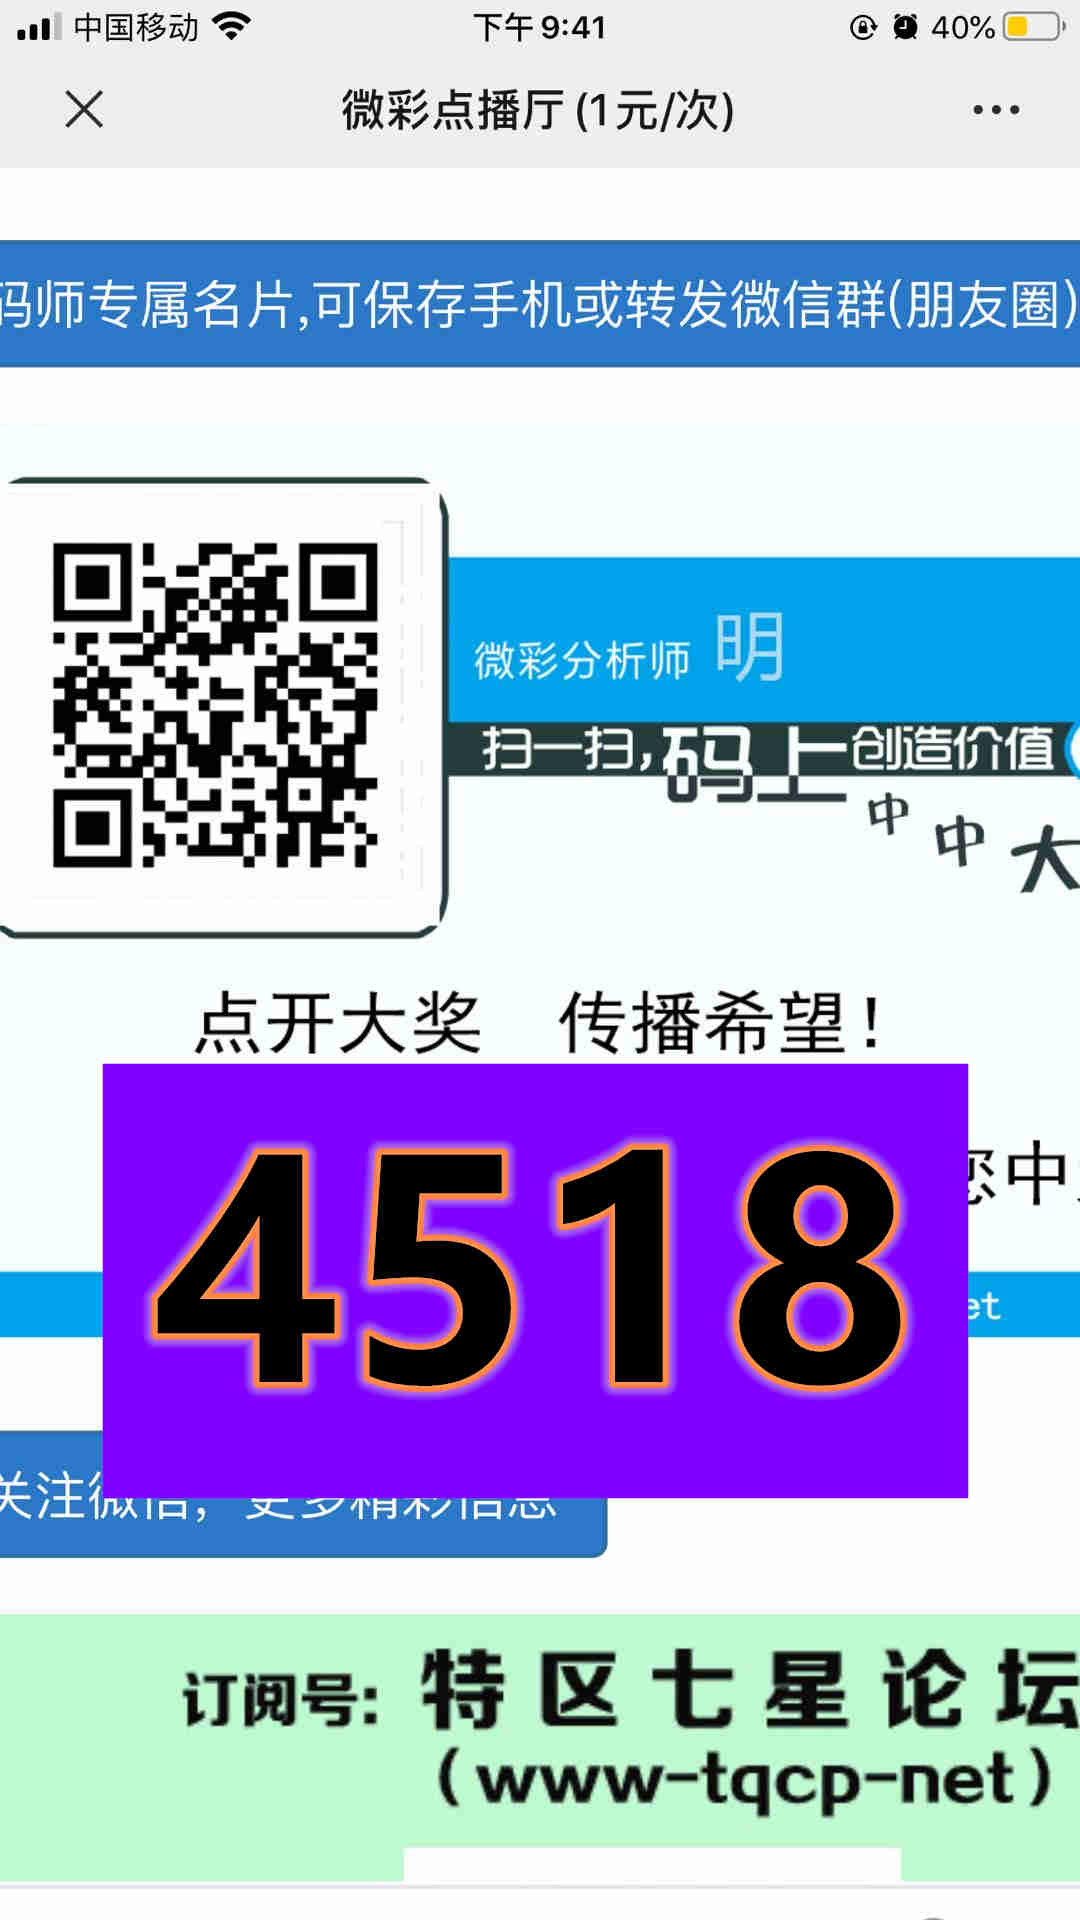 IMG_3201(20200509-210656)_副本.jpg